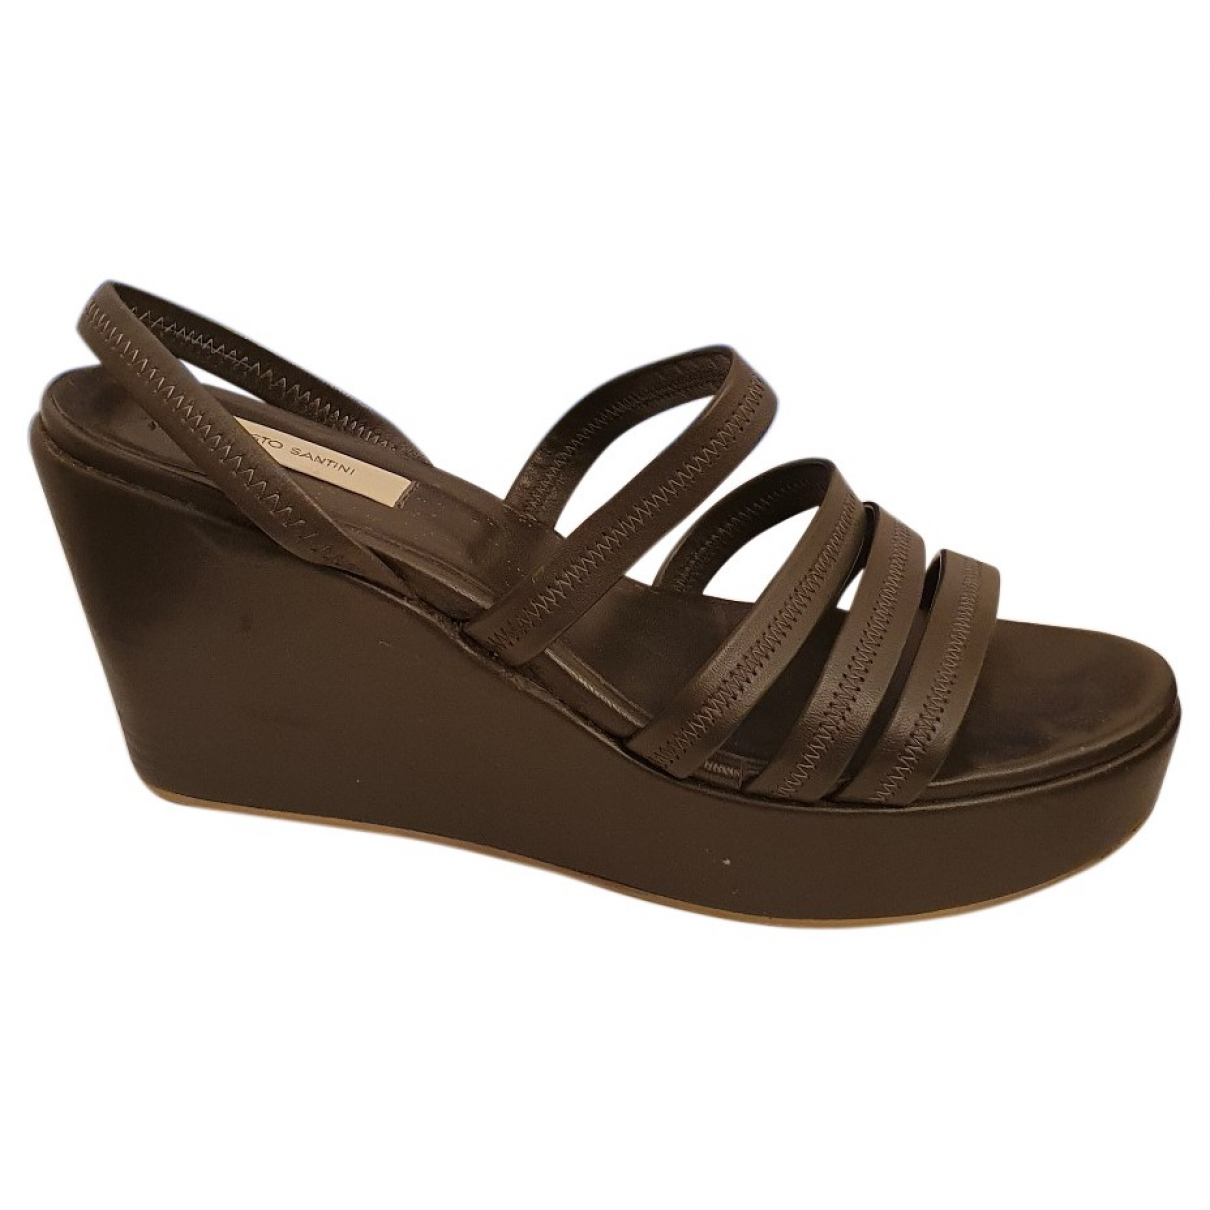 Fausto Santini \N Grey Leather Mules & Clogs for Women 40 EU